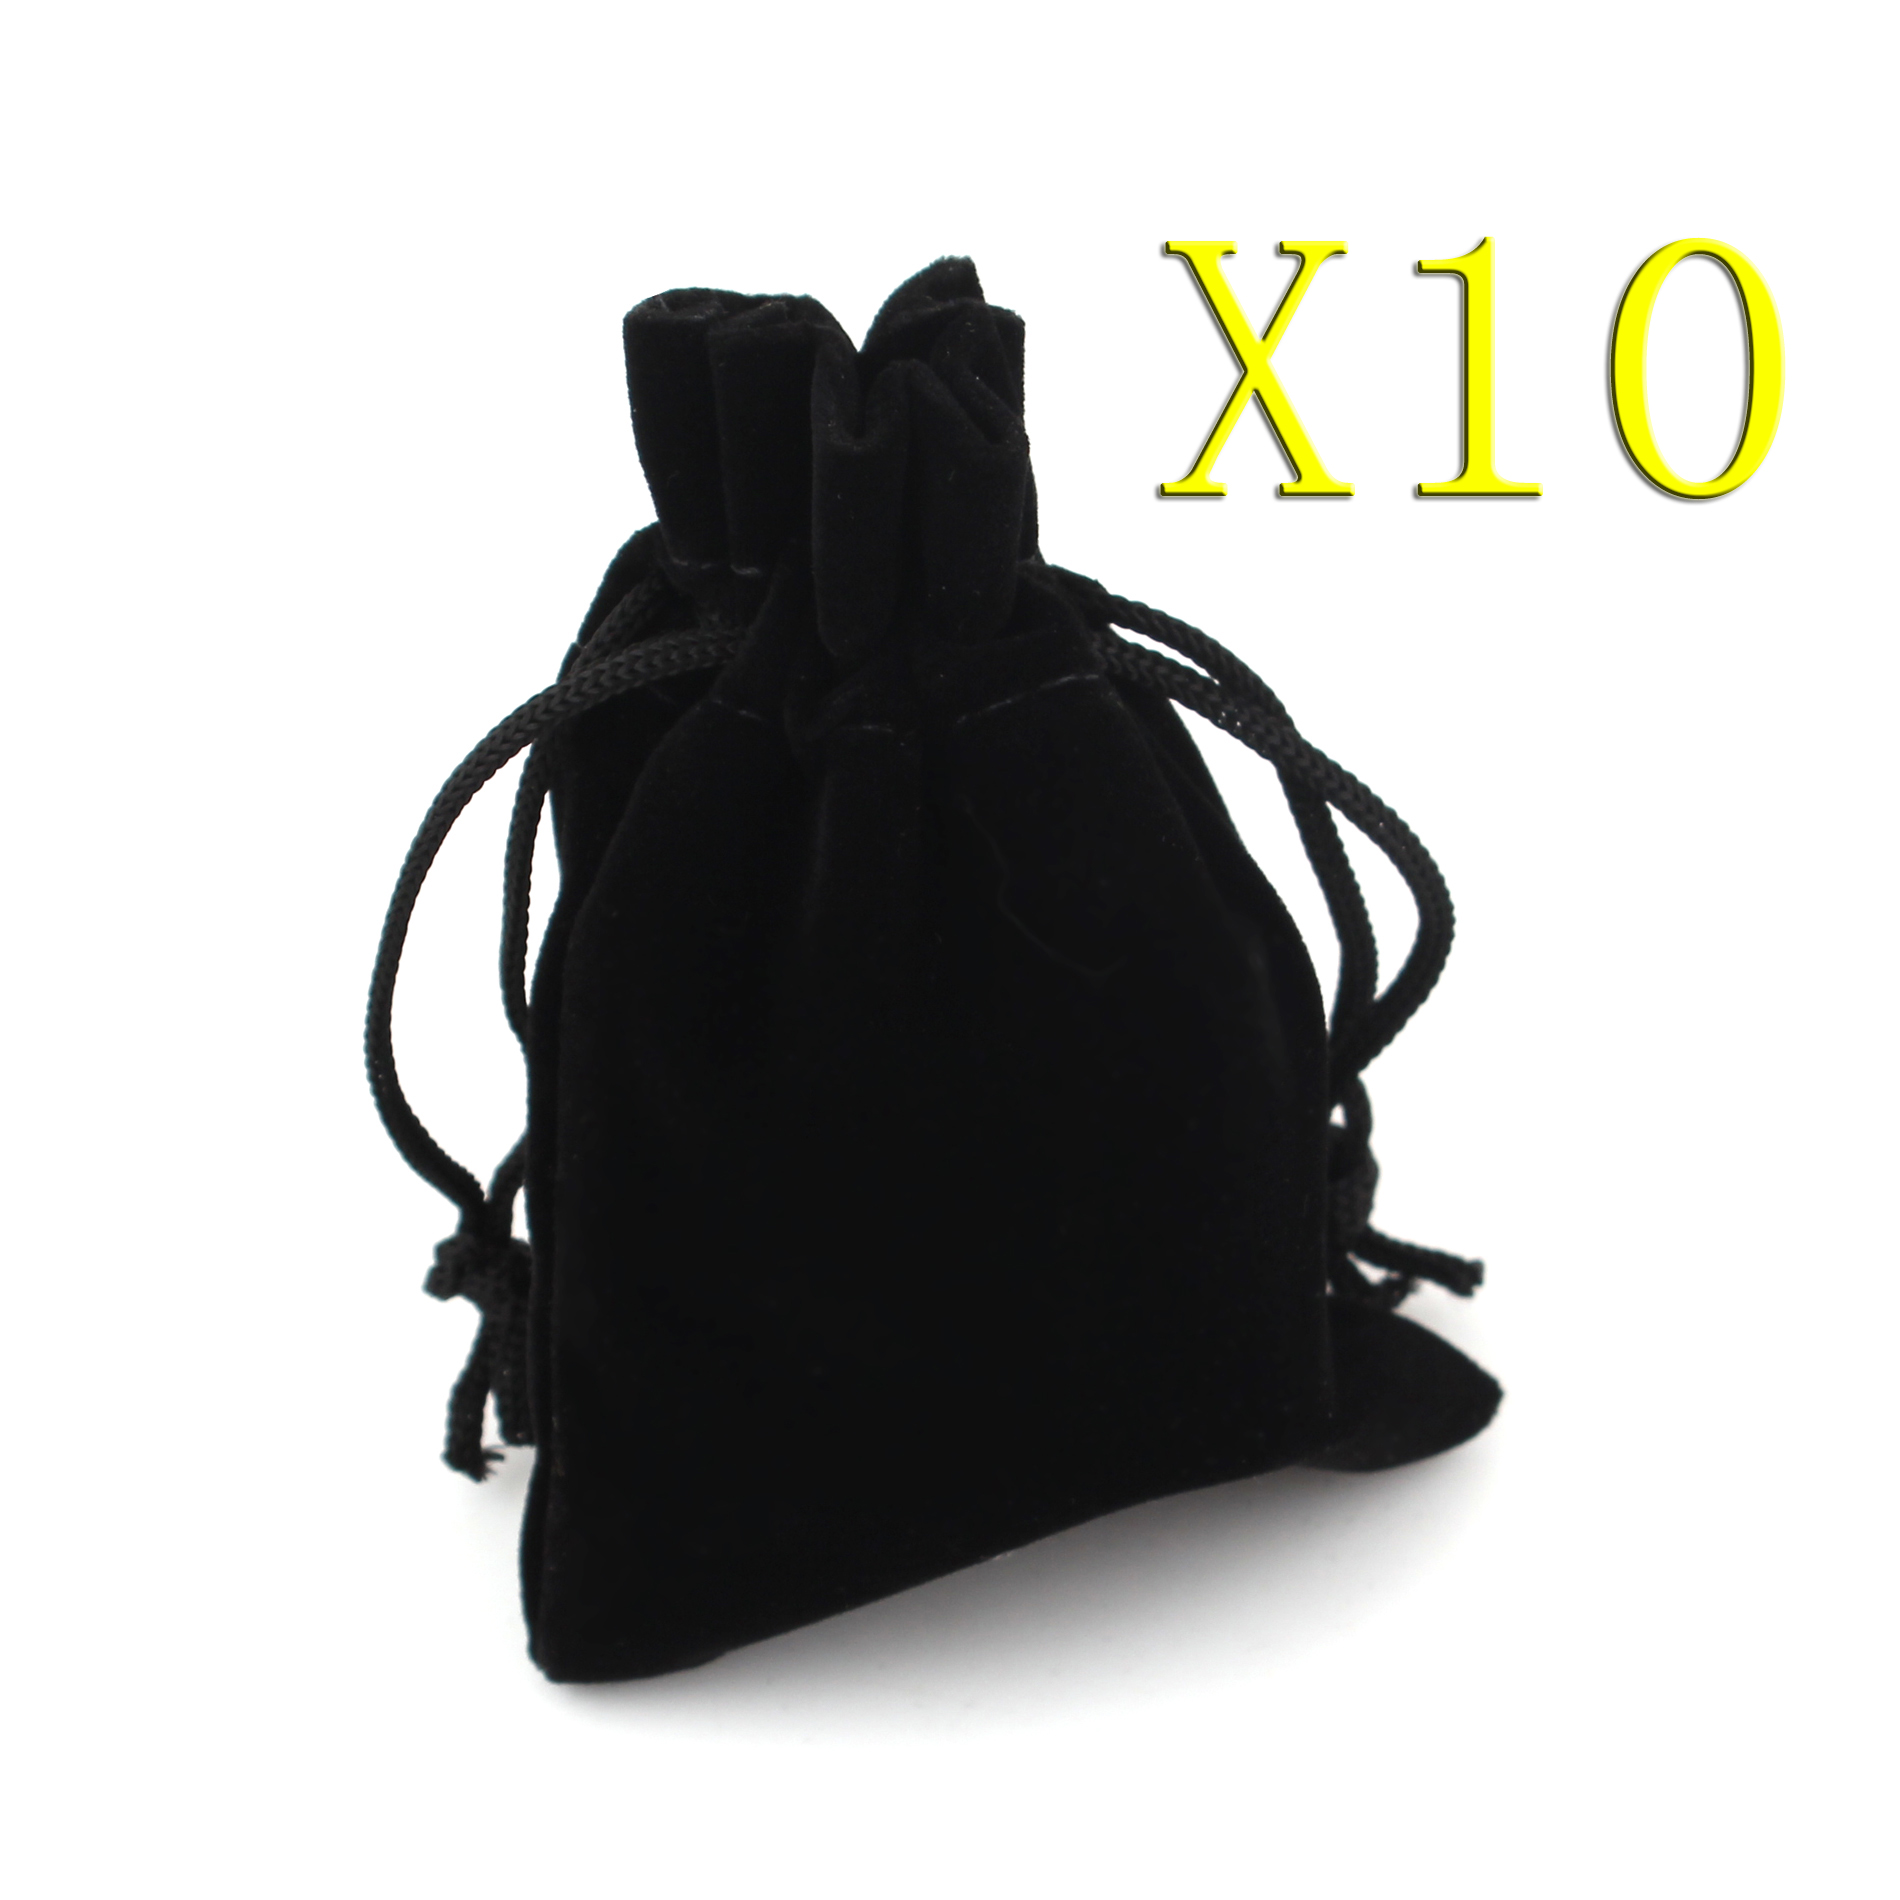 Velvet Jewellery Drawstring Gift Bag Pouches, 10pcs Jewelry Bags, 9x12cm